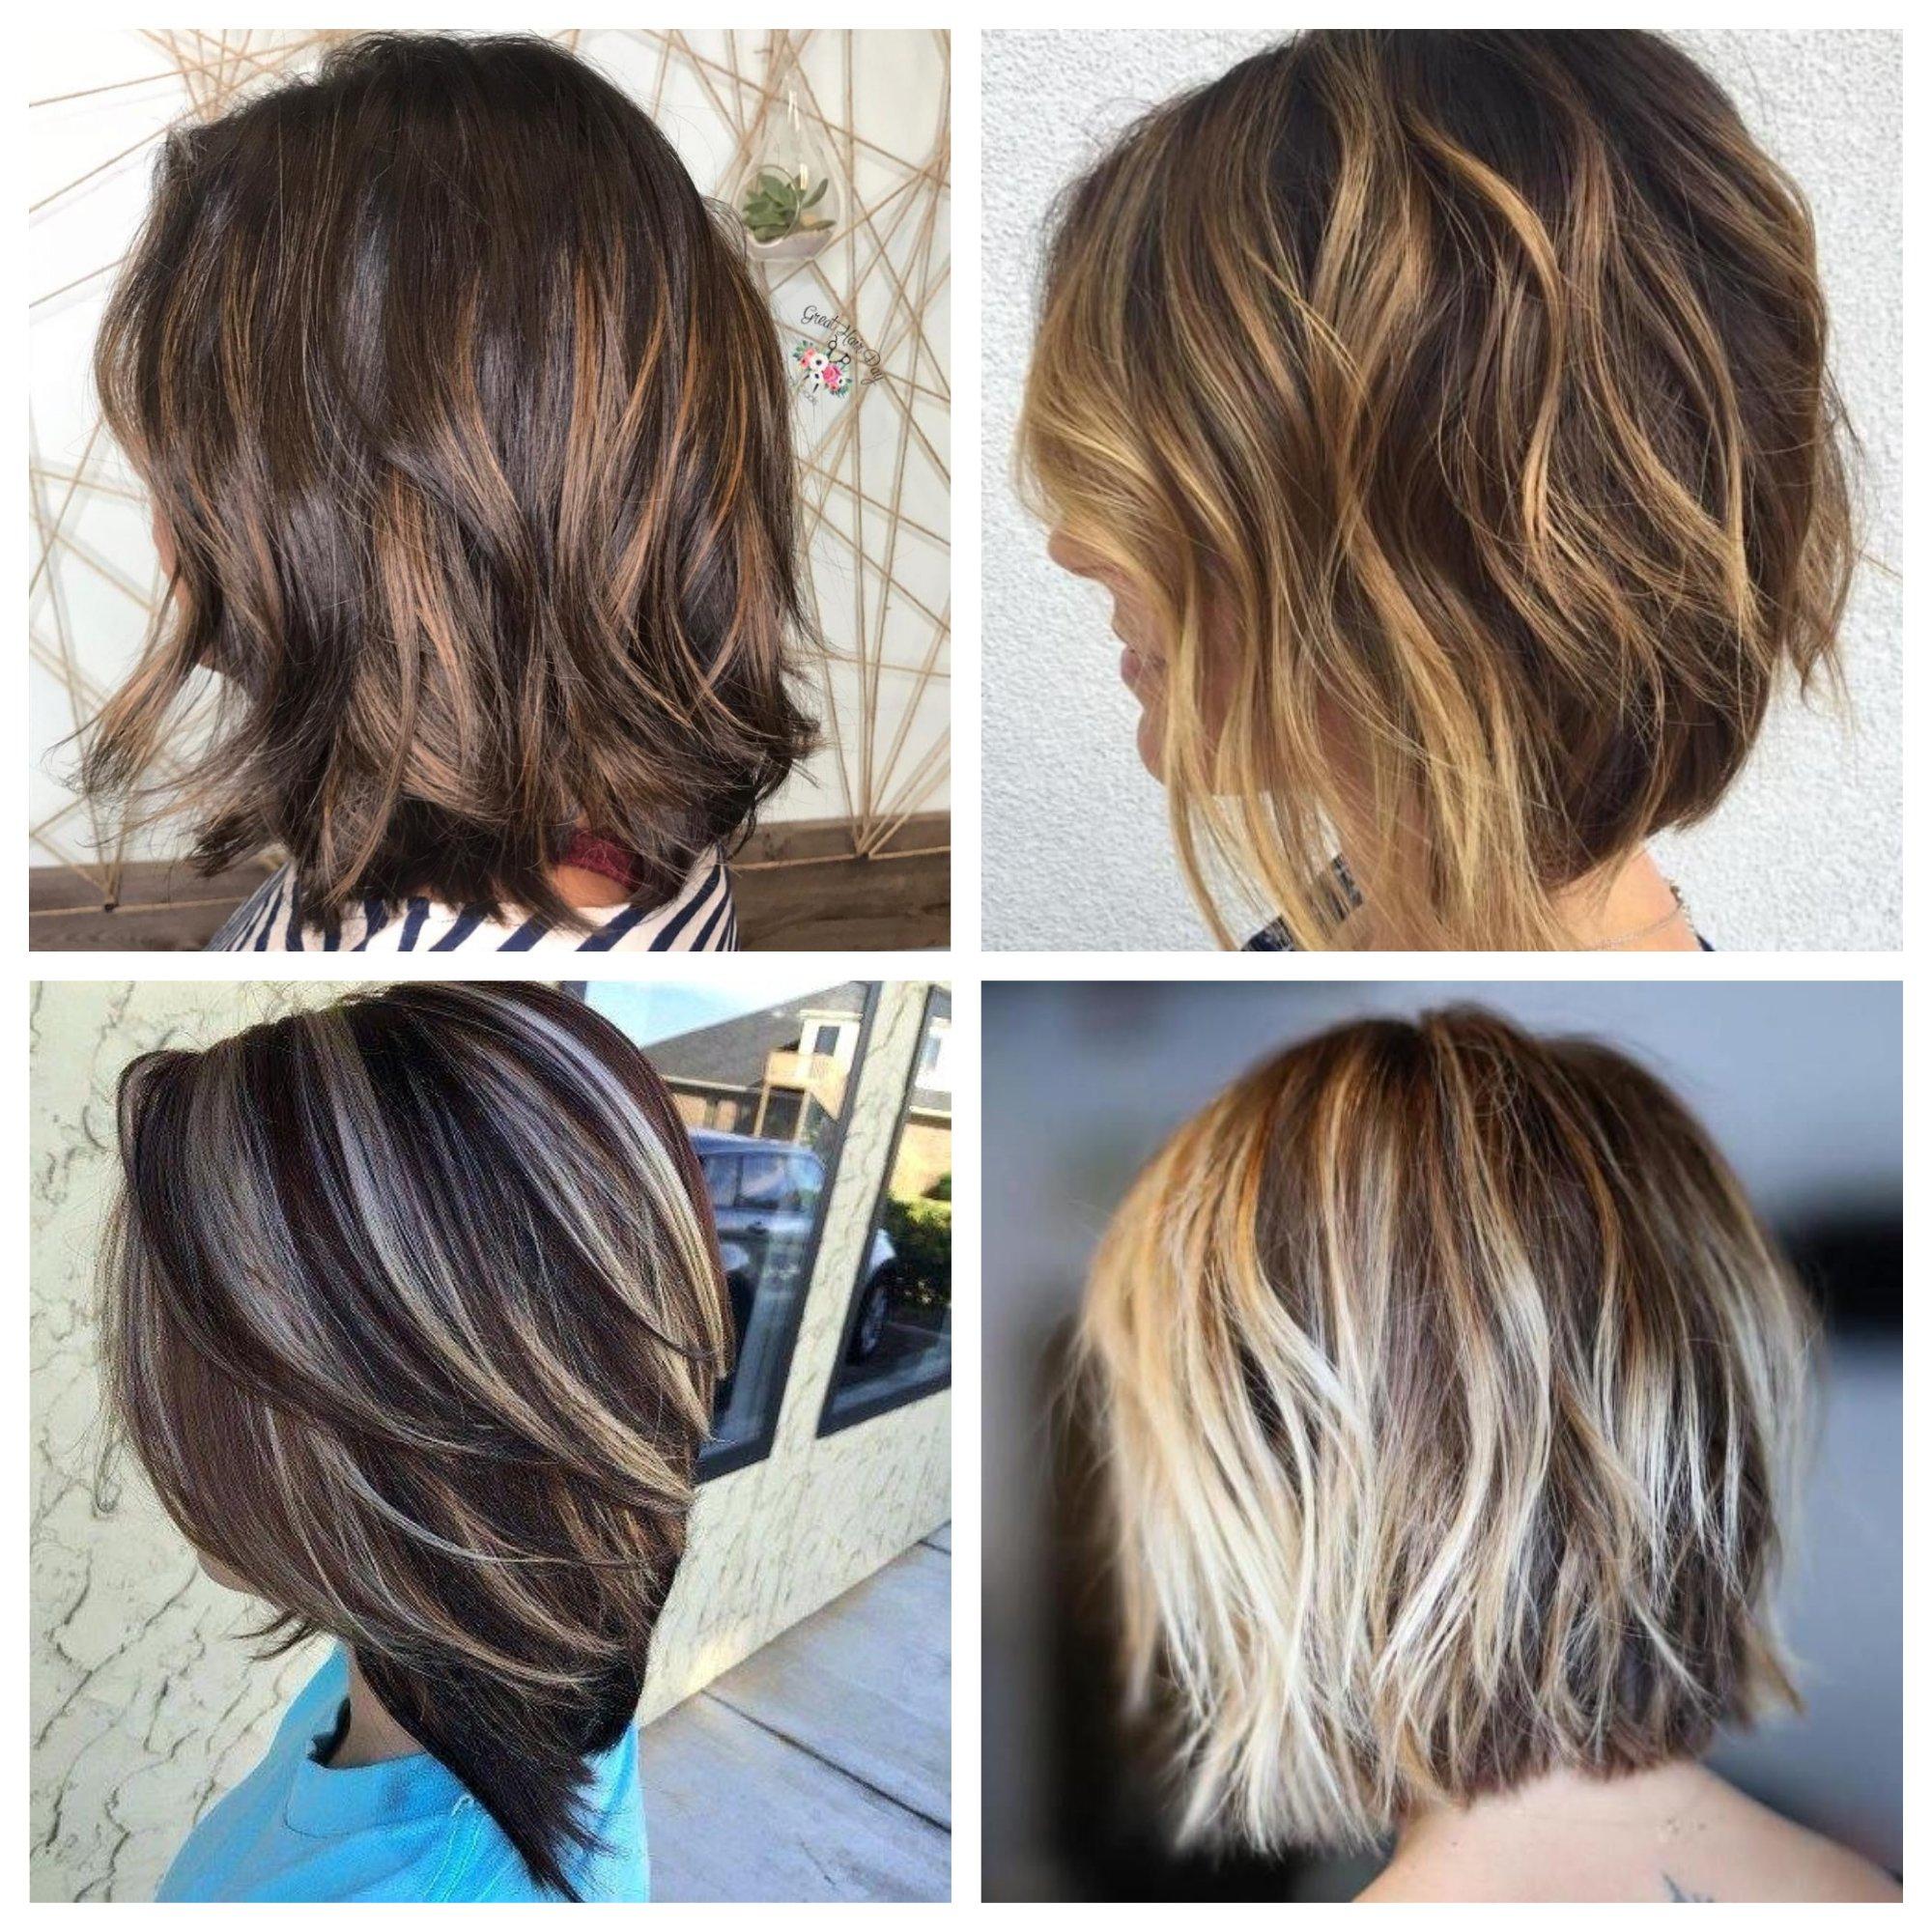 móc line tóc